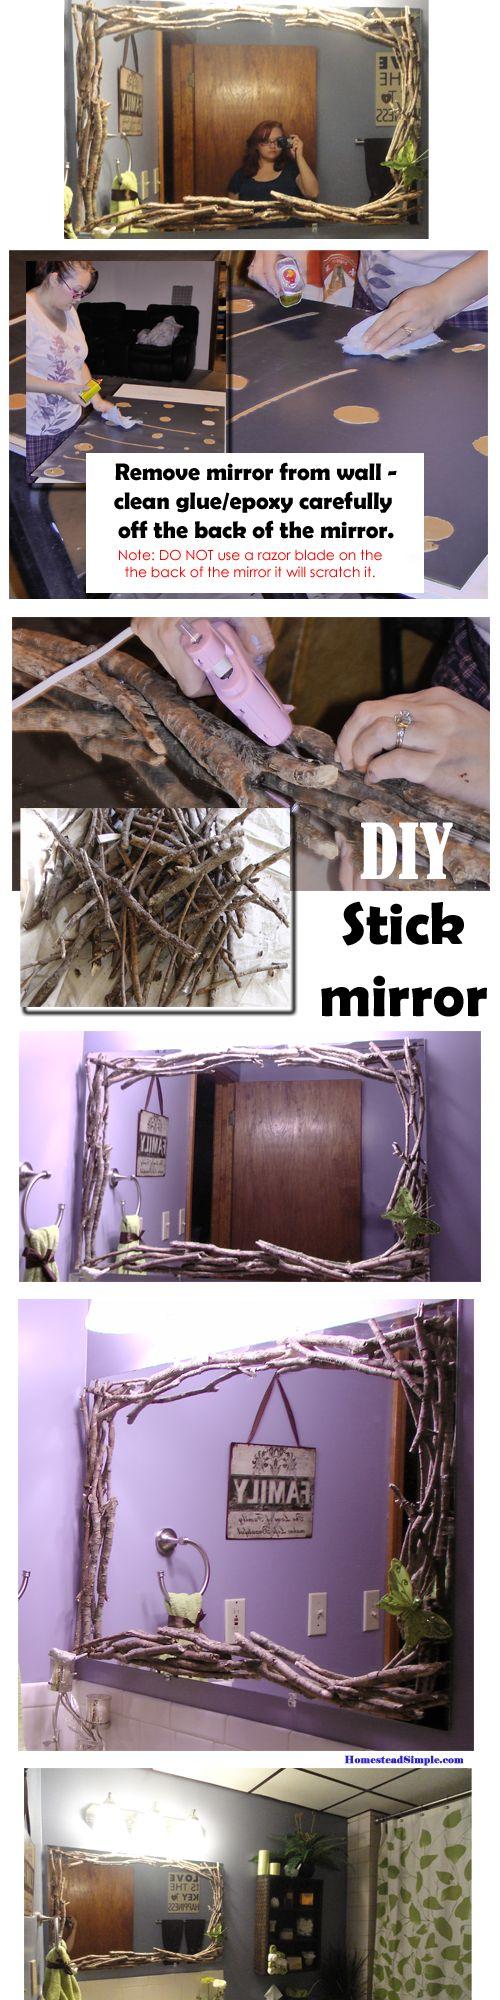 ... Stick Twig Mirror Frame Bathroom Home Decor Maybe. Download